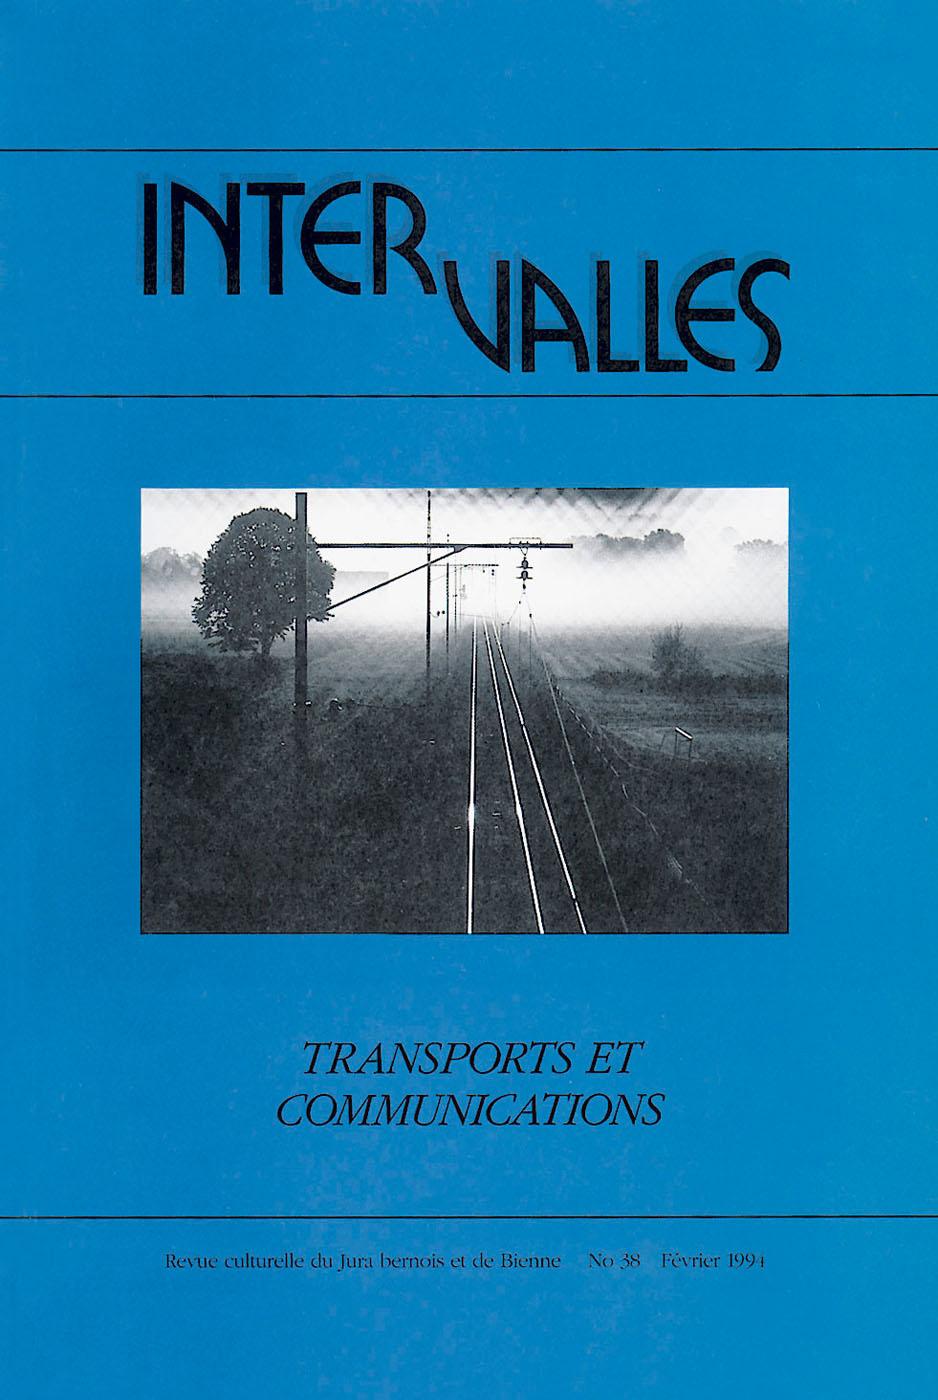 No 38 – Transports et communications